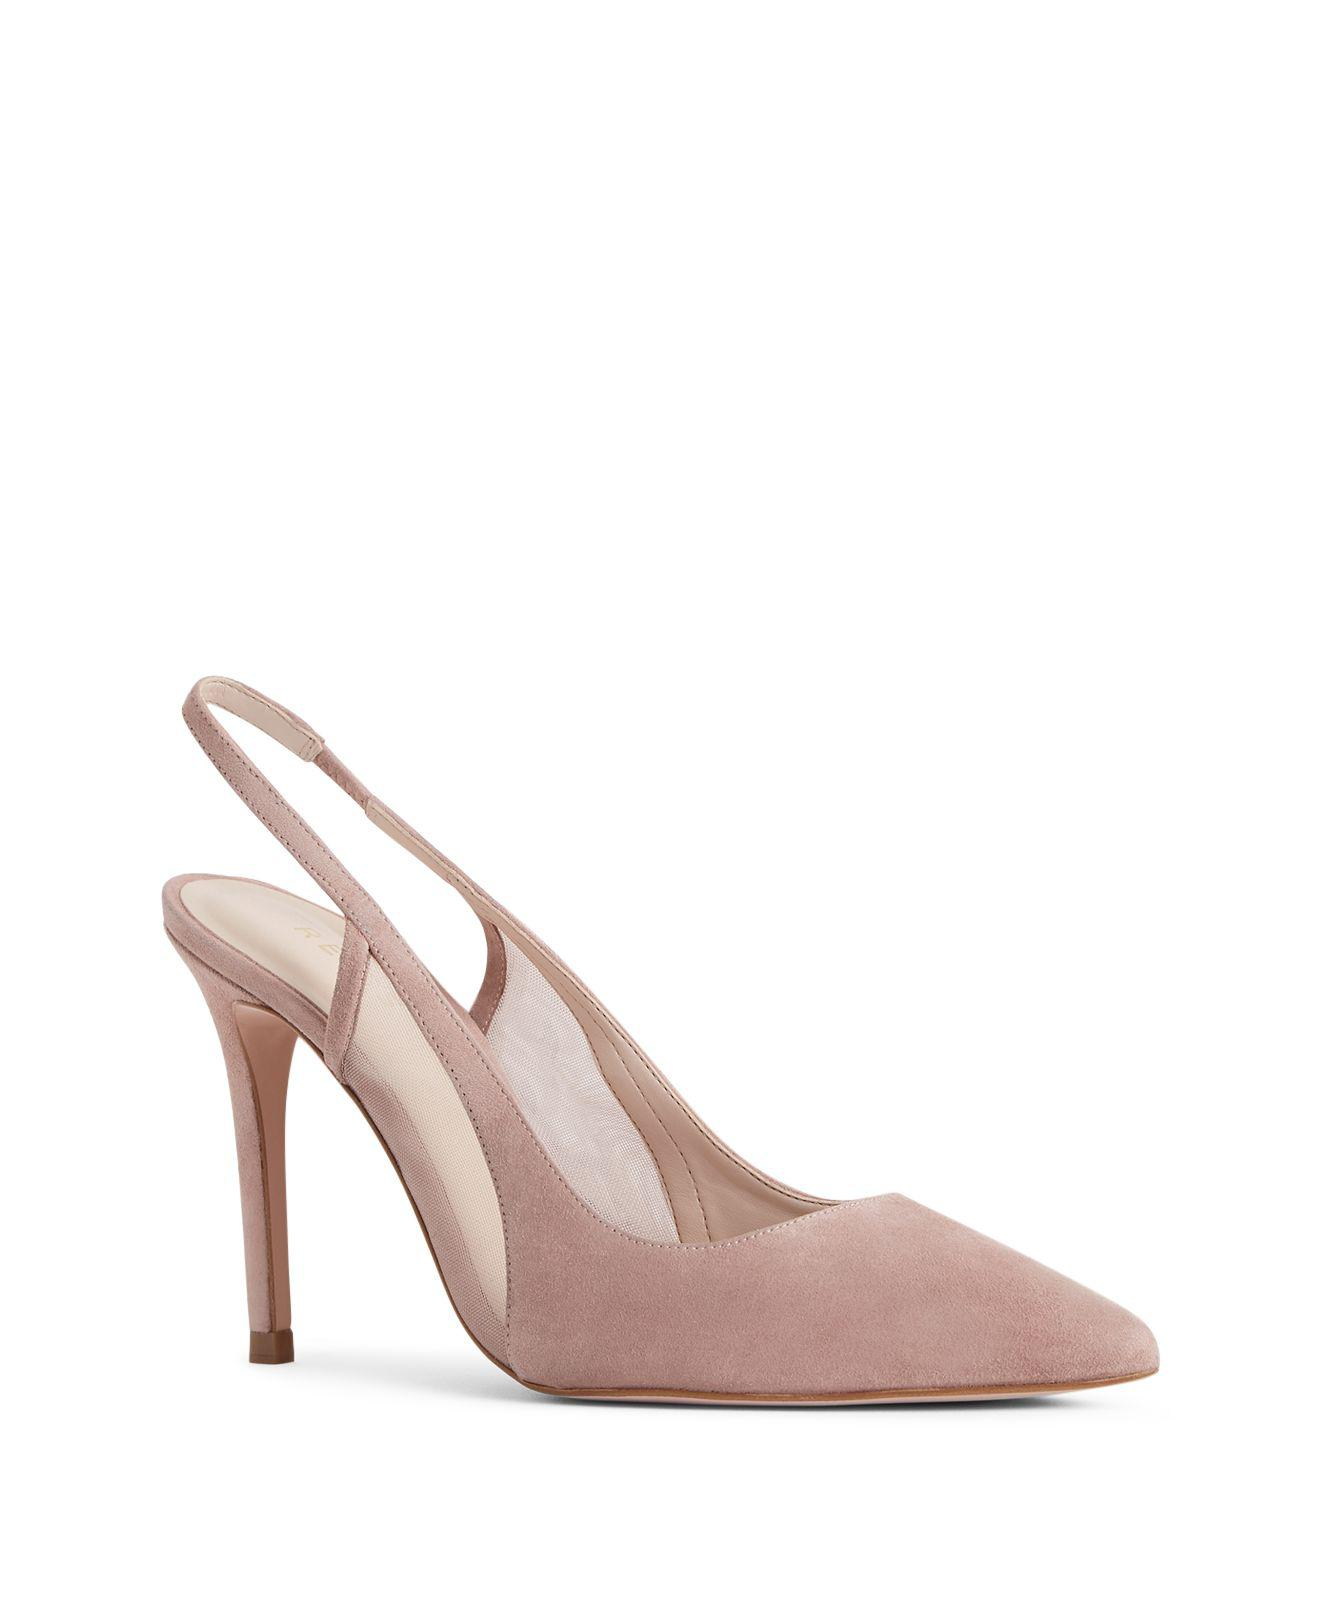 Reiss Clara - Sling-back Heels in Blush, Womens